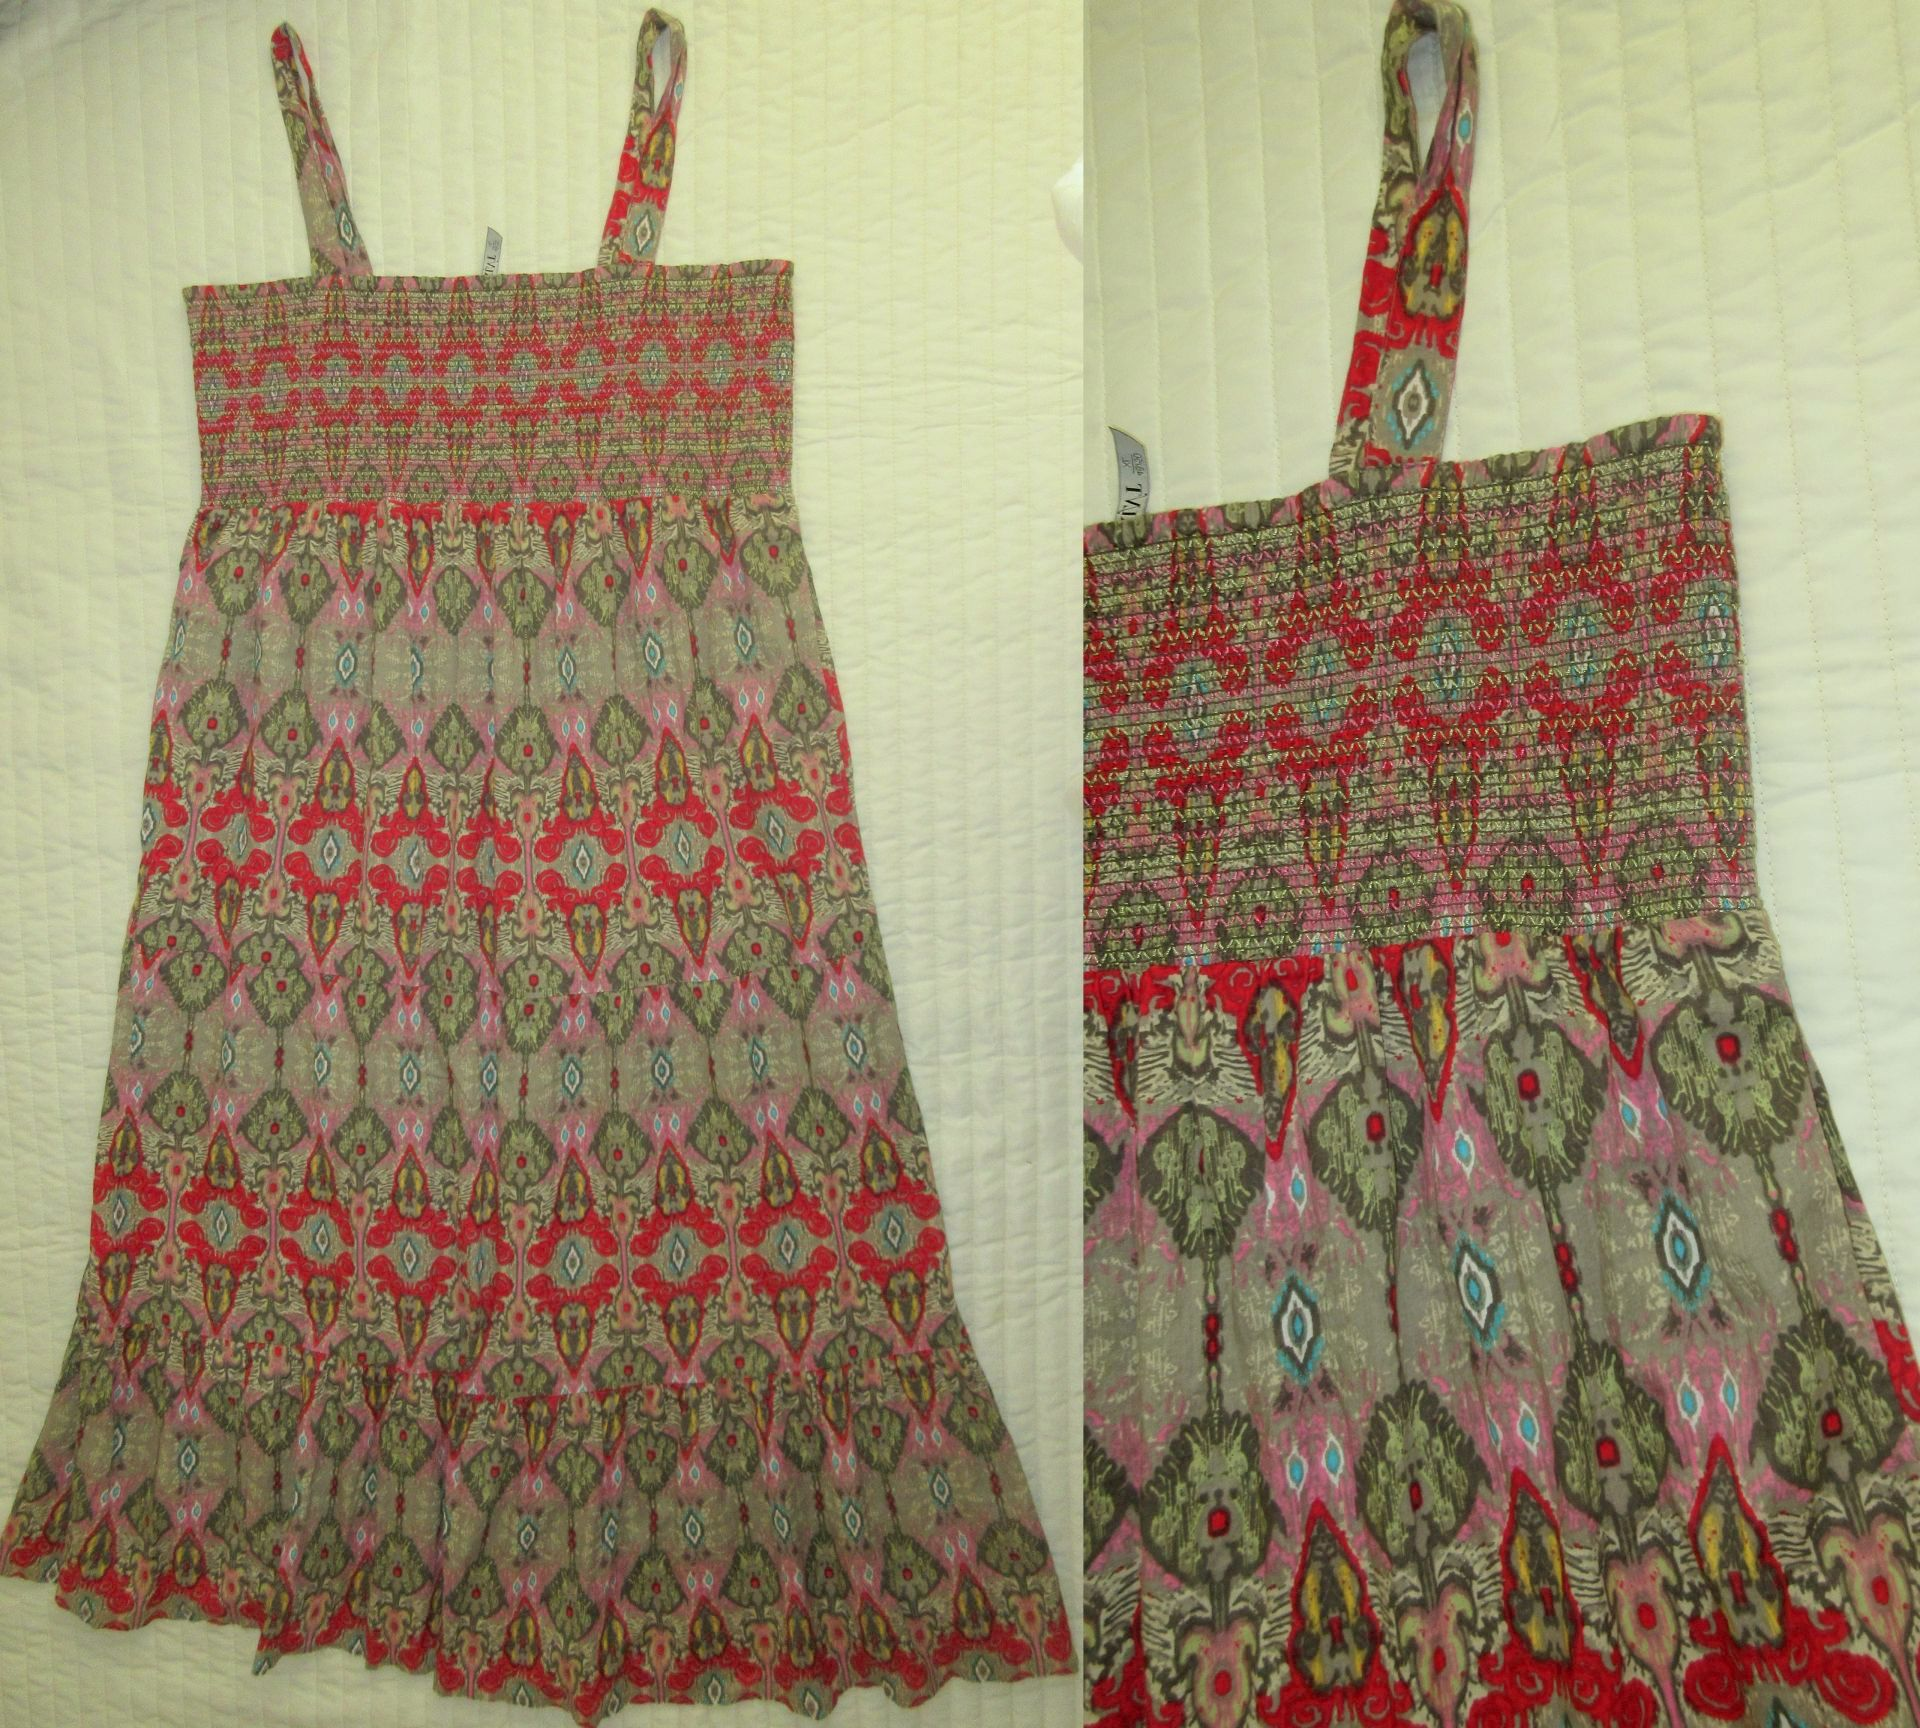 90c7a6afc6 Piękna sukienka Kappahl 48 50 maxi boho etno lato - 7374472715 ...